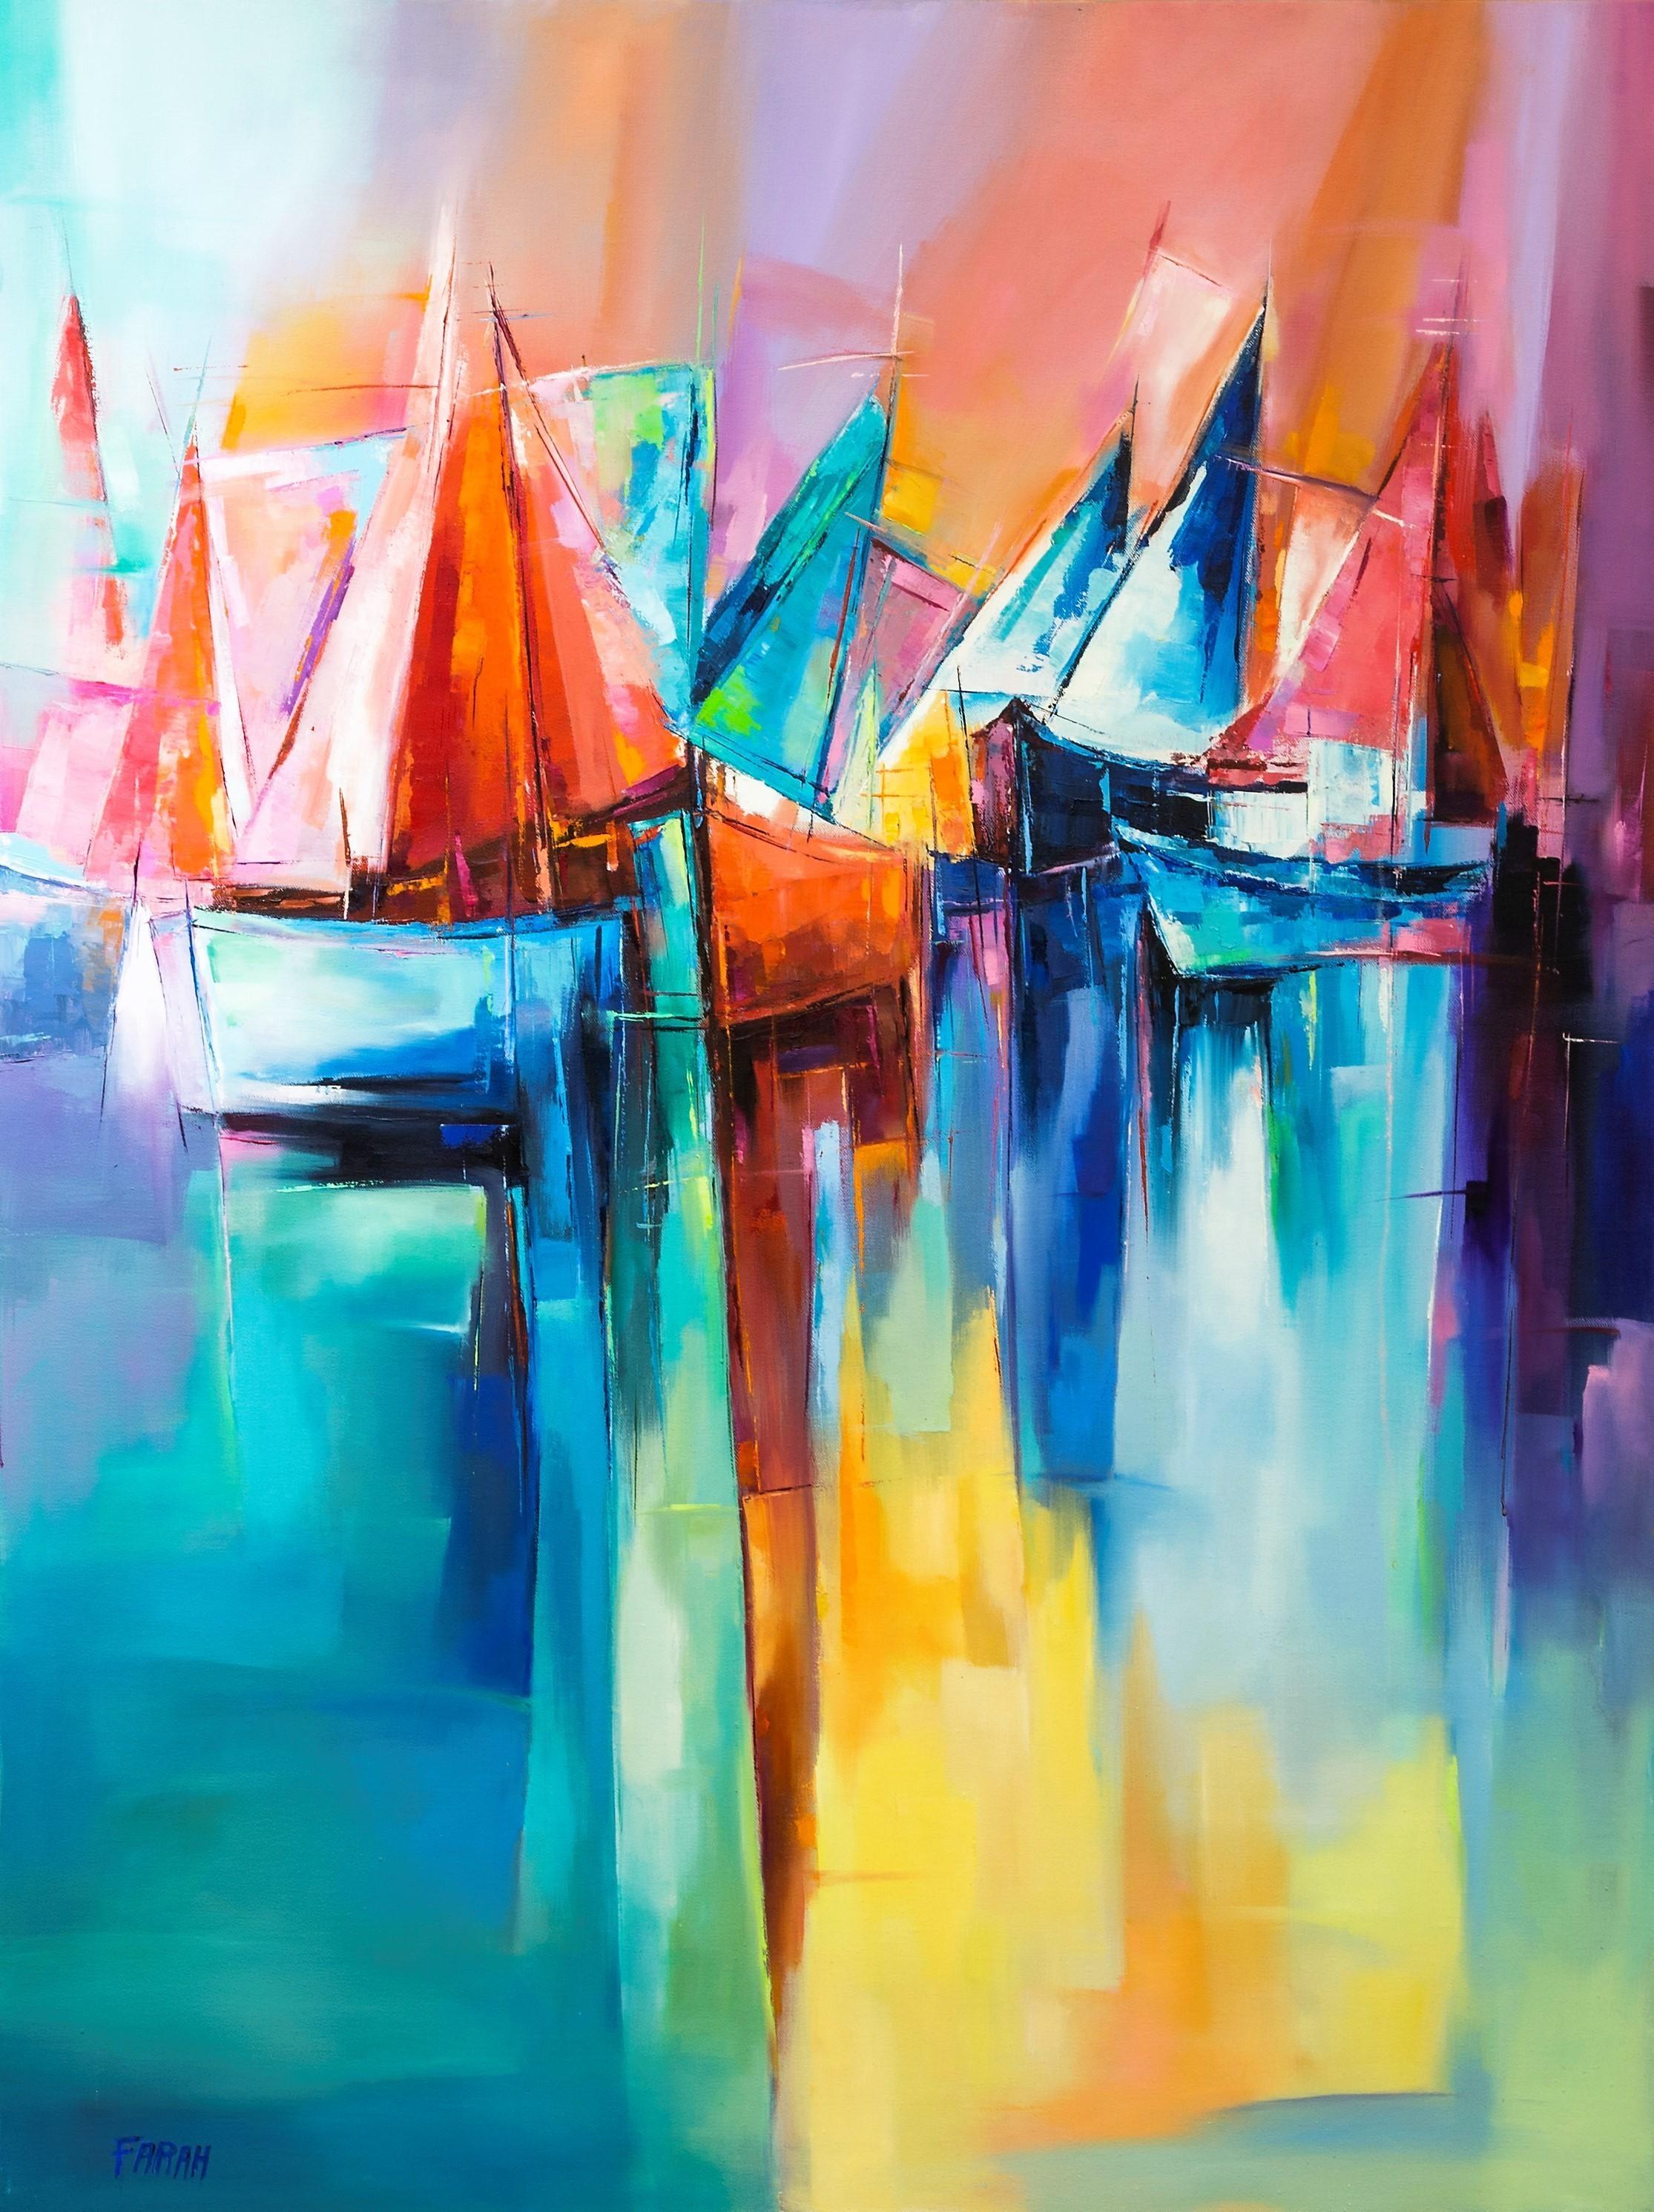 Farahnaz Samari Living on th Edge 4 Oil on Canvas 48x36